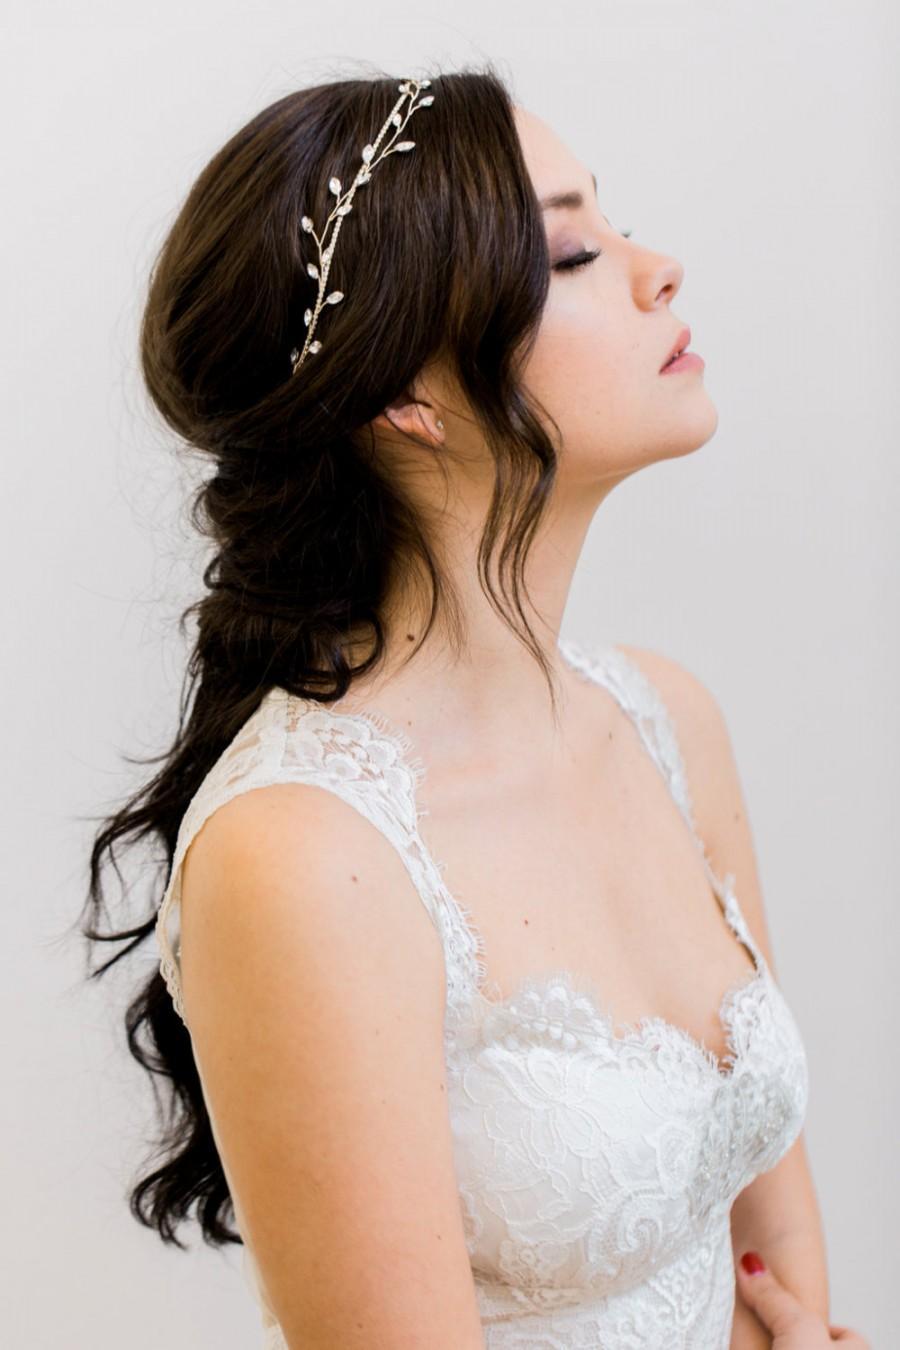 Hochzeit - Crystal Headband, Crystal Halo, Boho Headband, Bridal Headband, Crystal Hair Vine, Bridal Hair Vine, Boho Bridal Halo, Boho Hair Piece